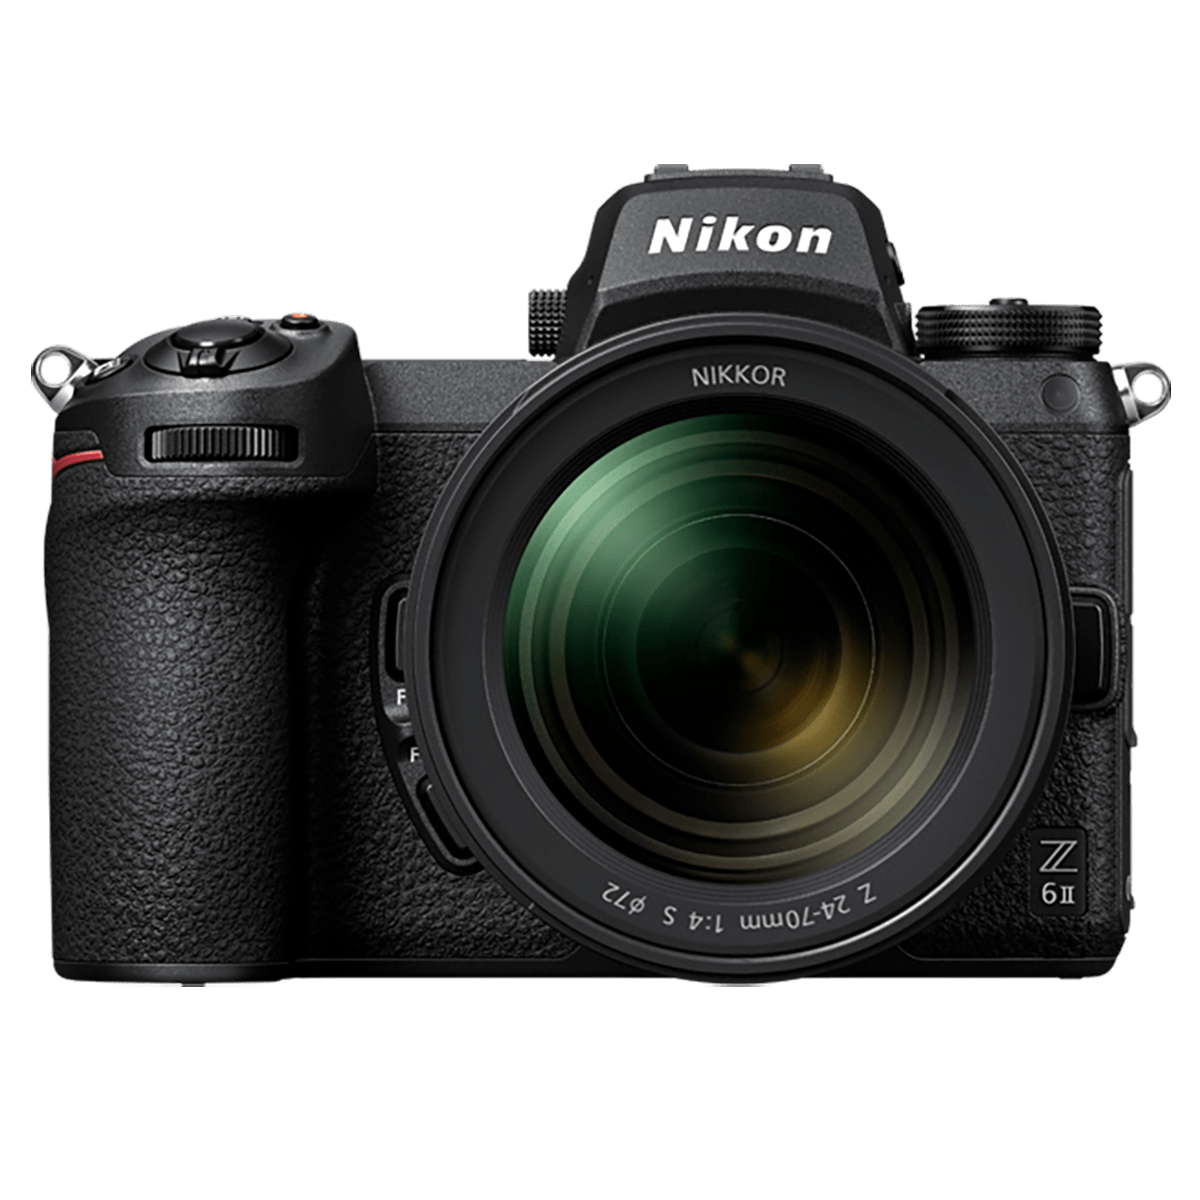 Nikon Z 6II 24.5 MP Mirrorless Camera (24-70 mm, Dual EXPEED 6 Image Processors, VOK060XN, Black)